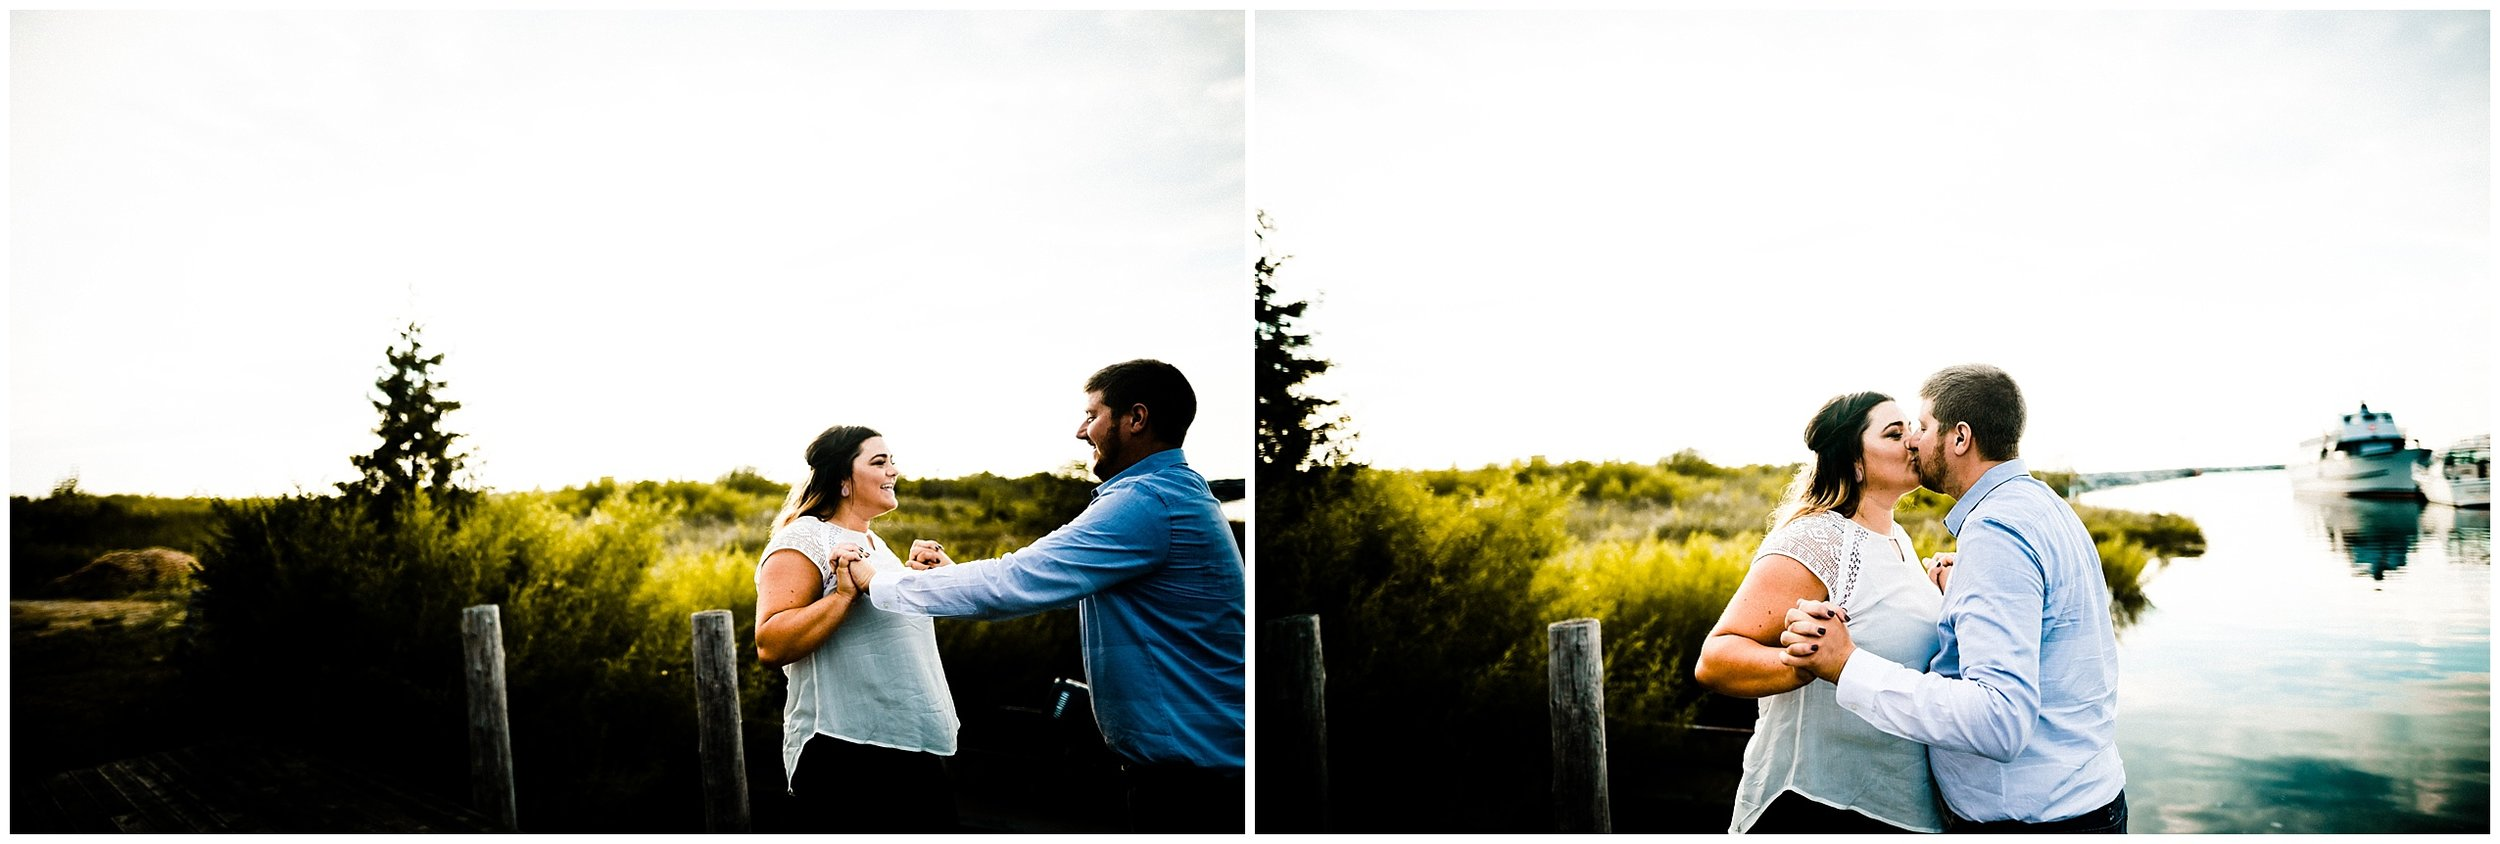 Kyle + Emily | Engaged #kyleepaigephotography_0495.jpg